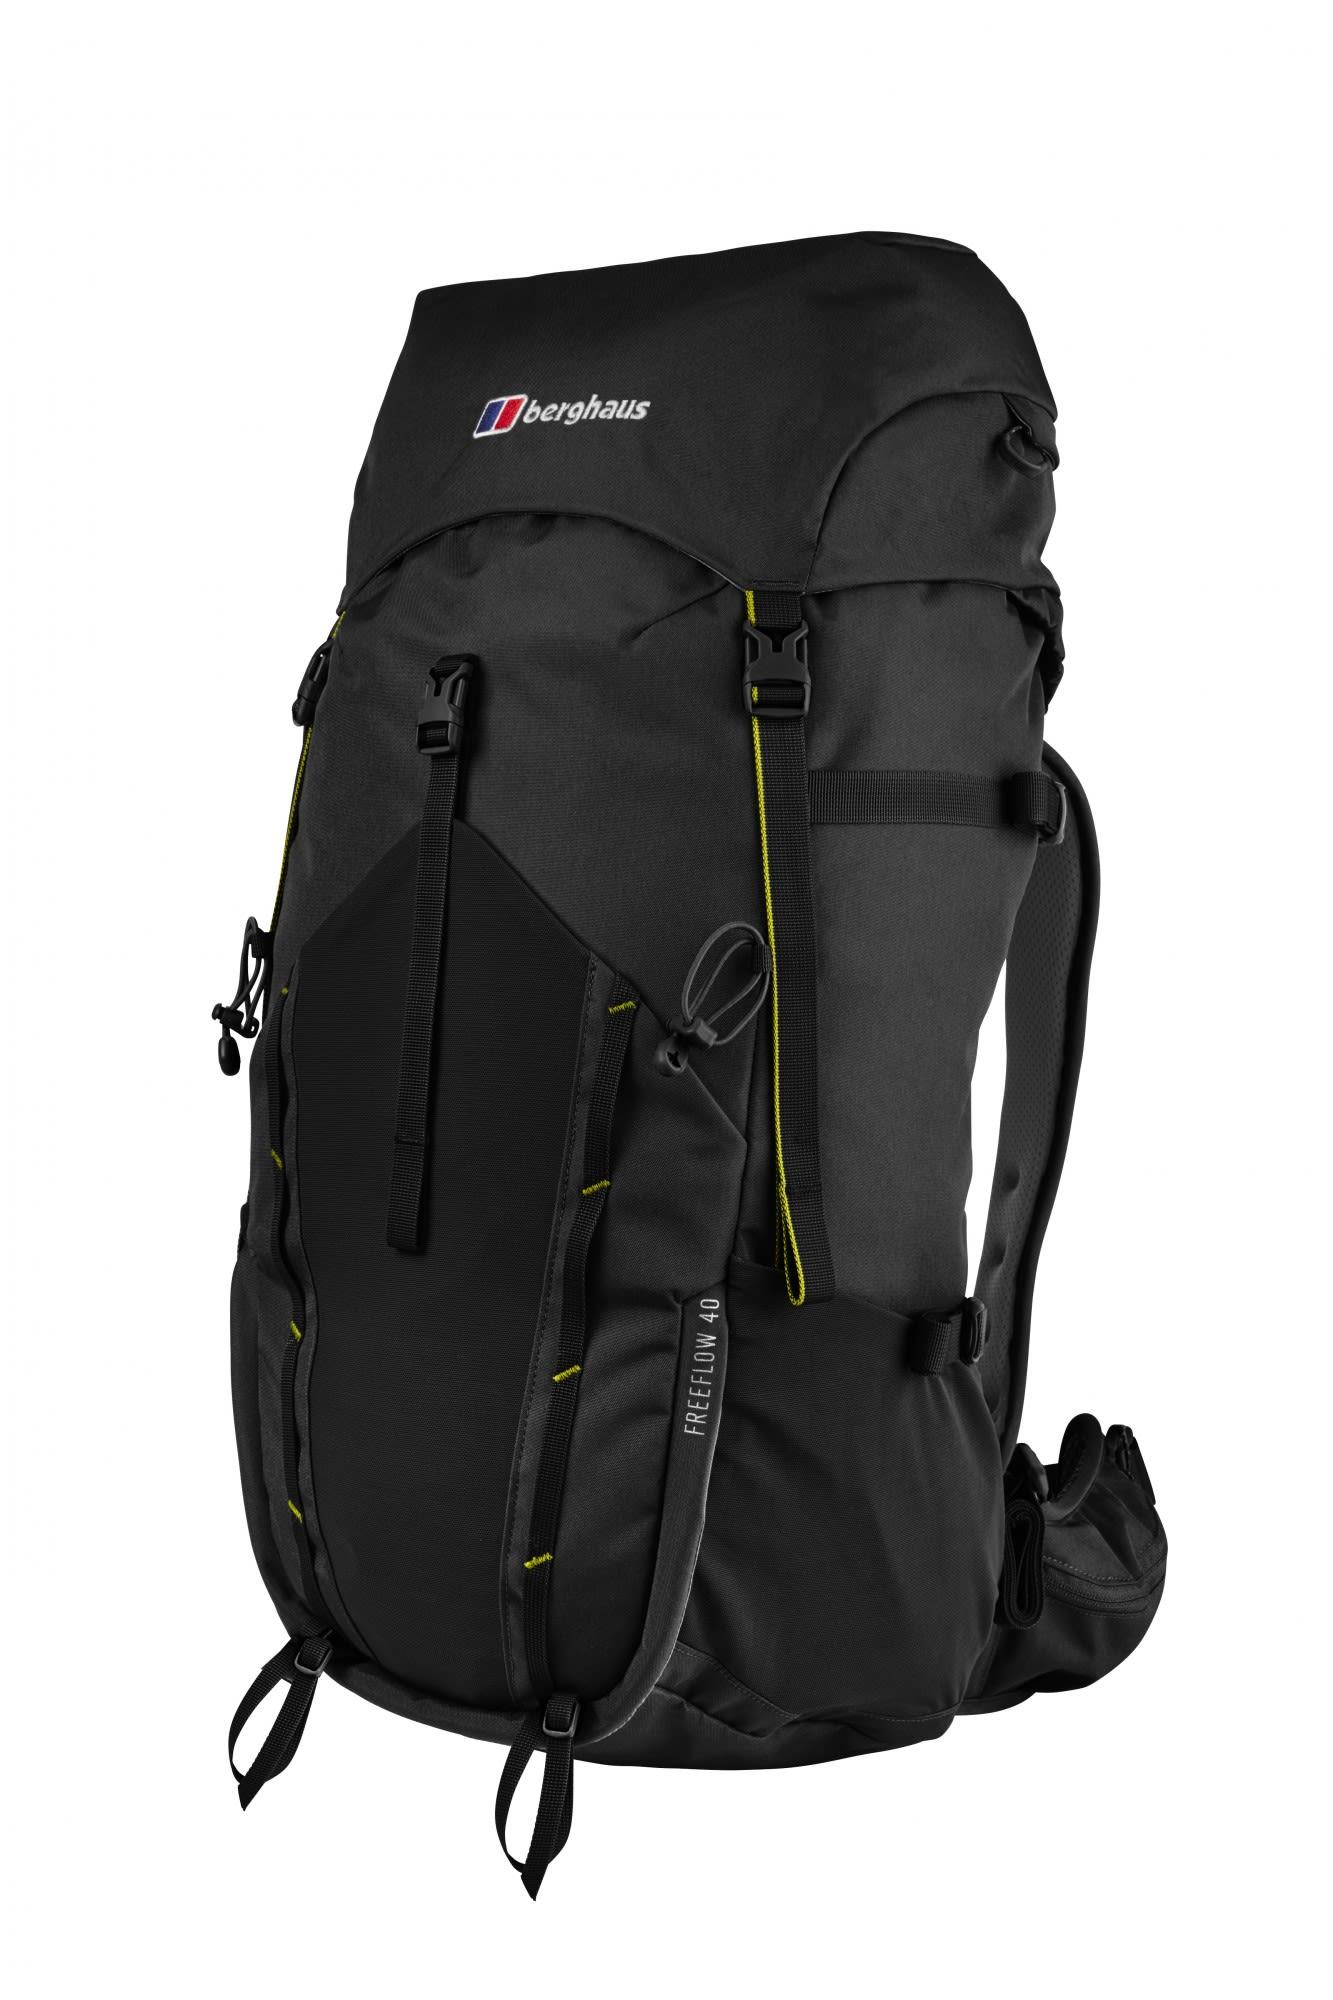 Berghaus Freeflow 40 Backpack | Größe 40l |  Alpin- & Trekkingrucksack